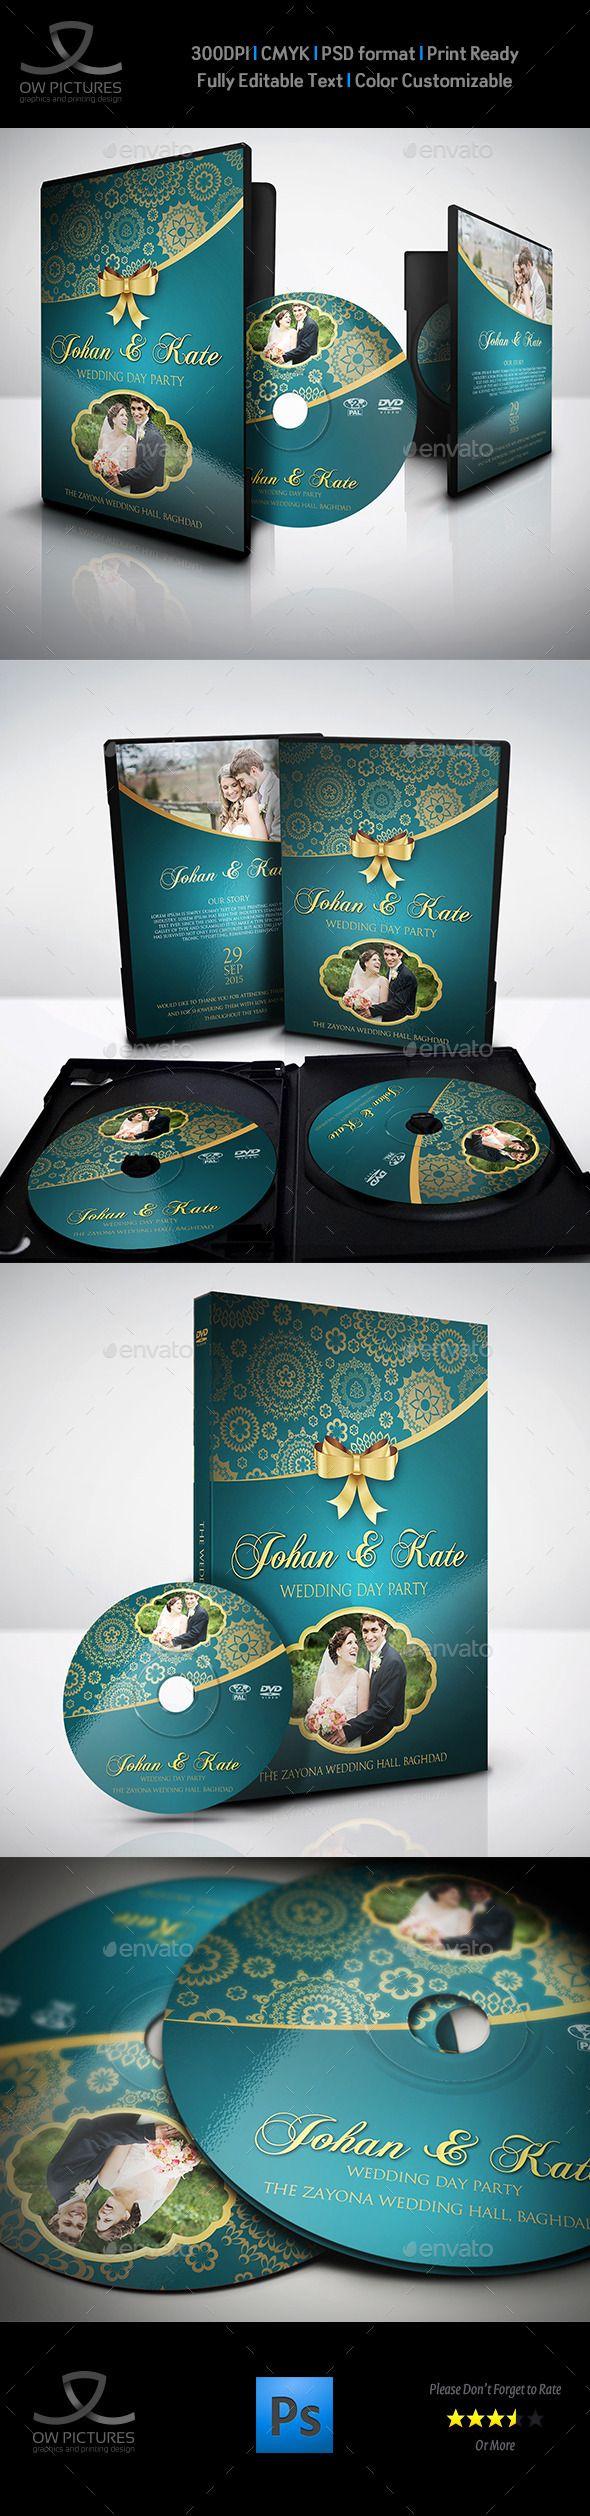 2 cd label template